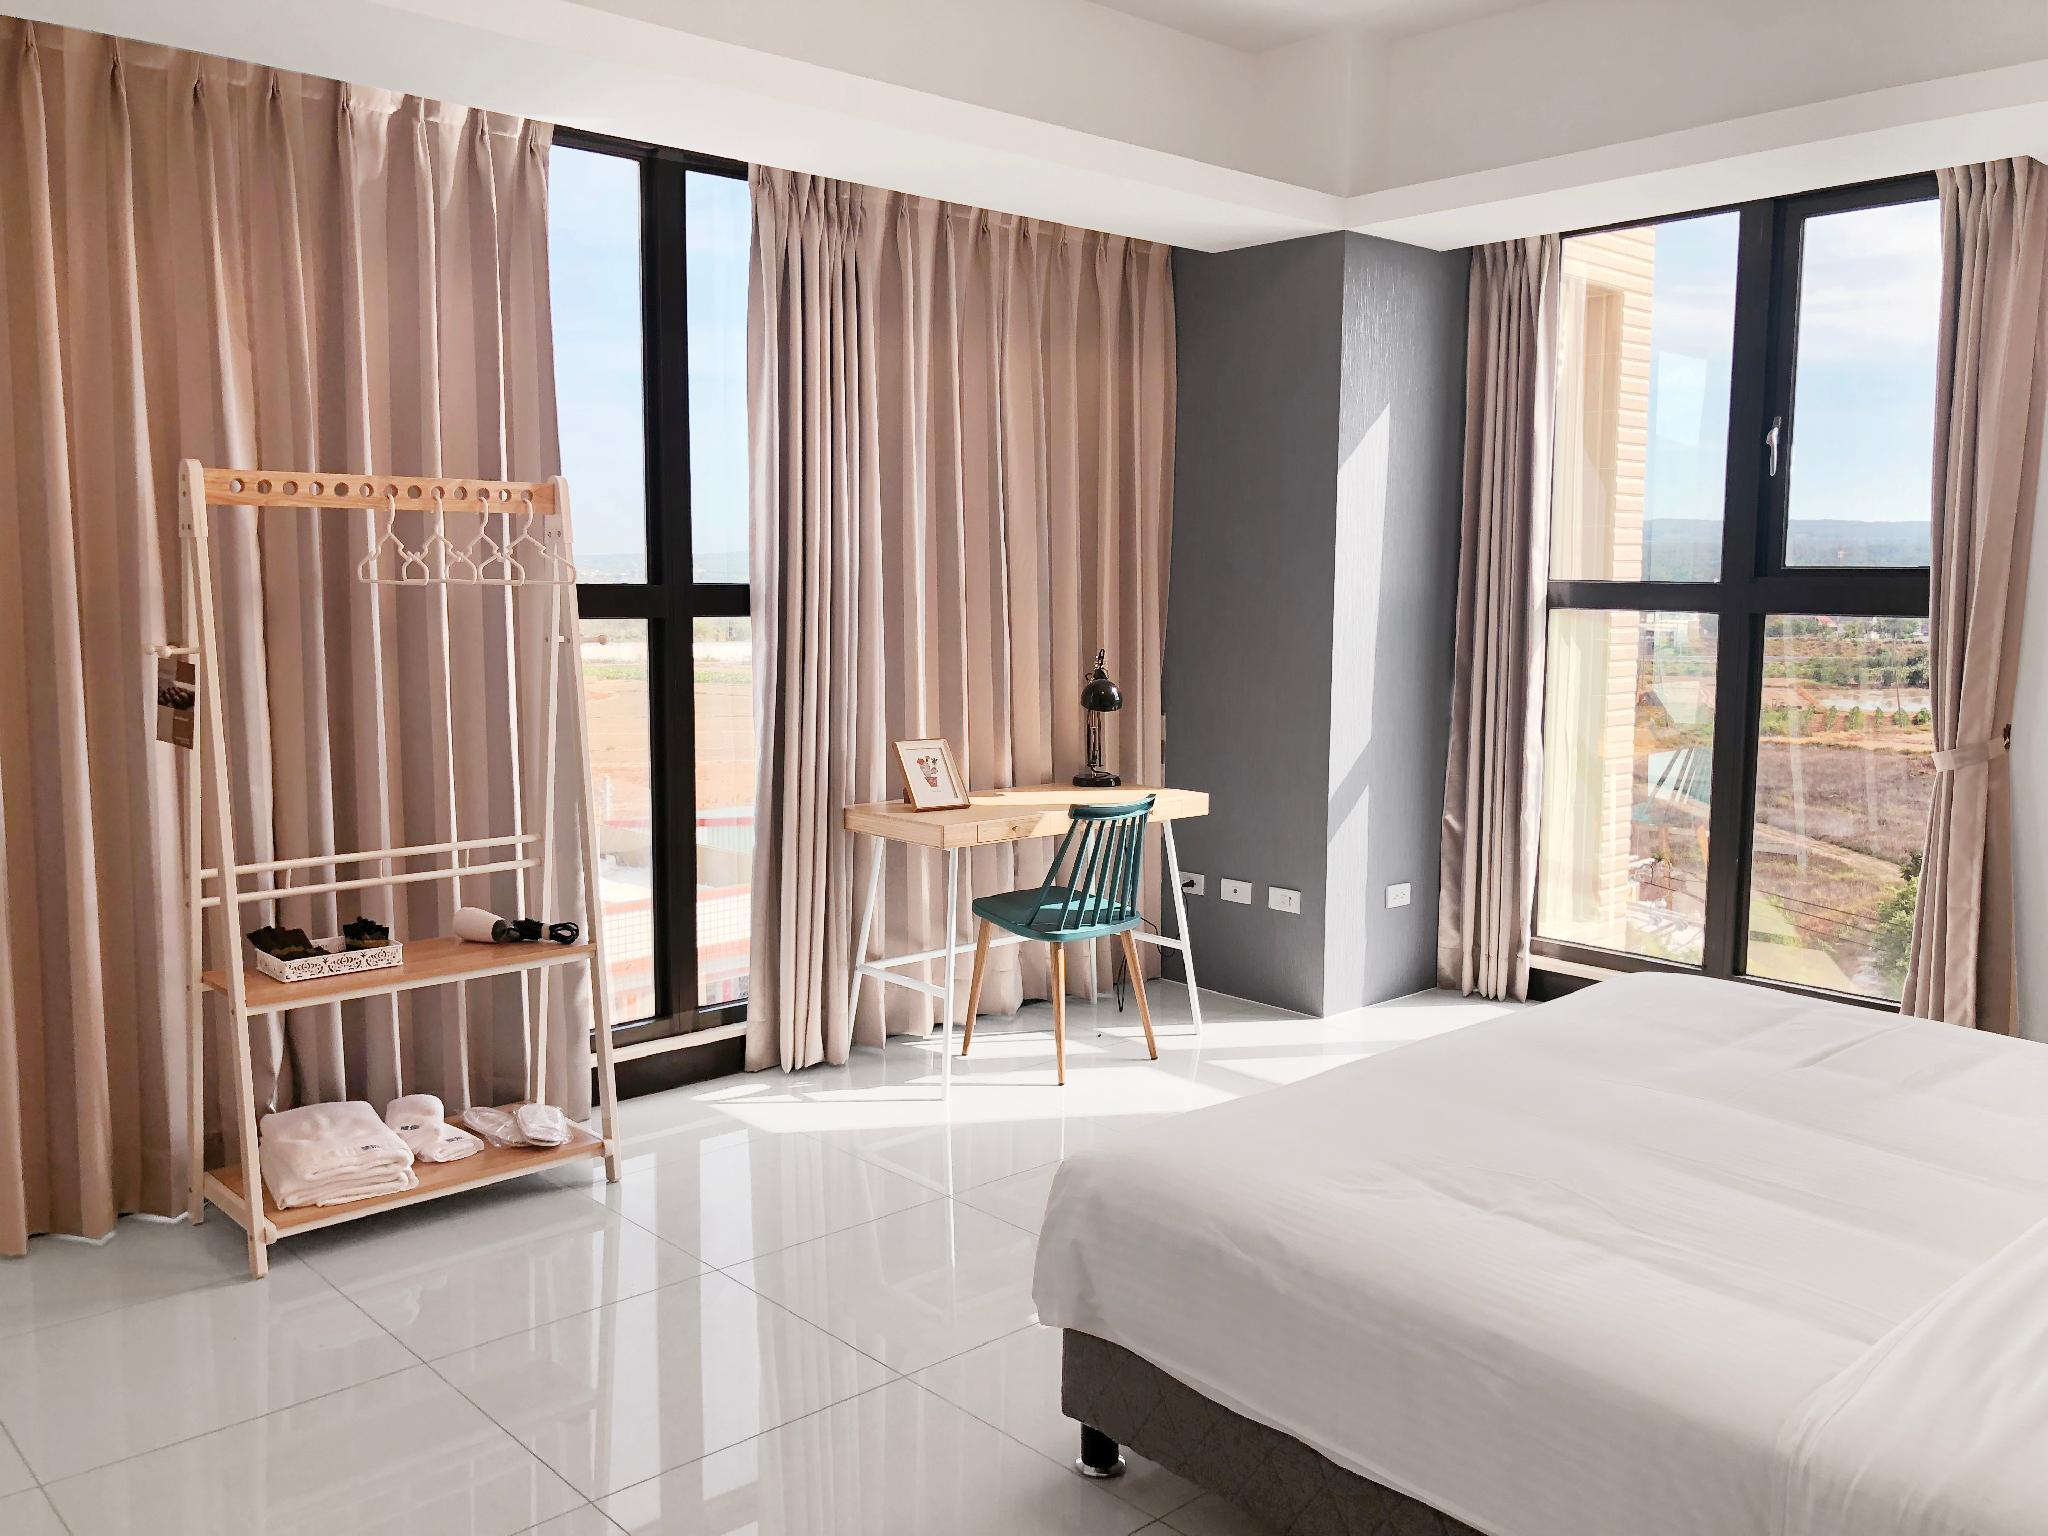 Sea View Penthouse Hotel